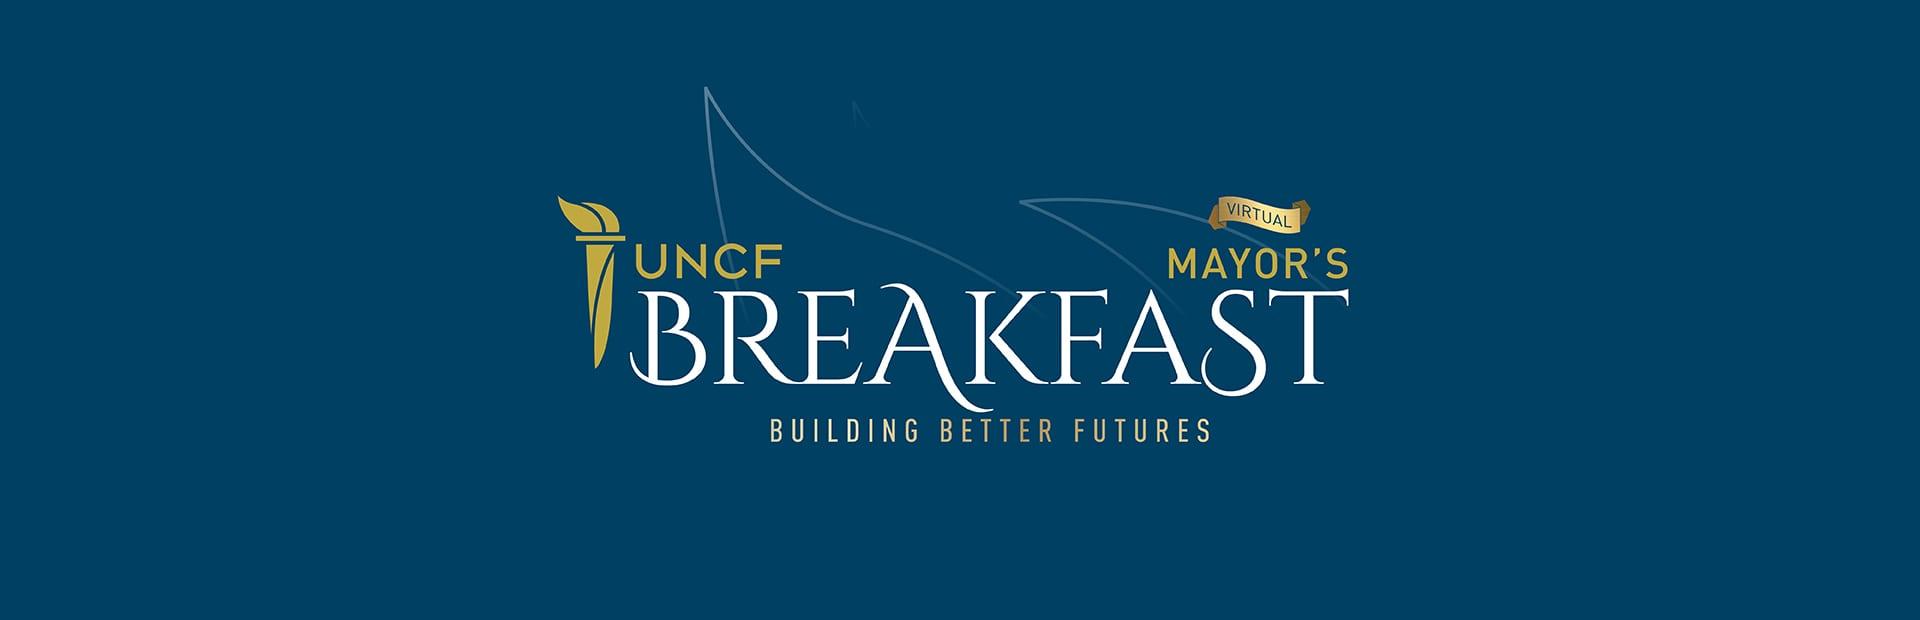 virtual mayors breakfast banner